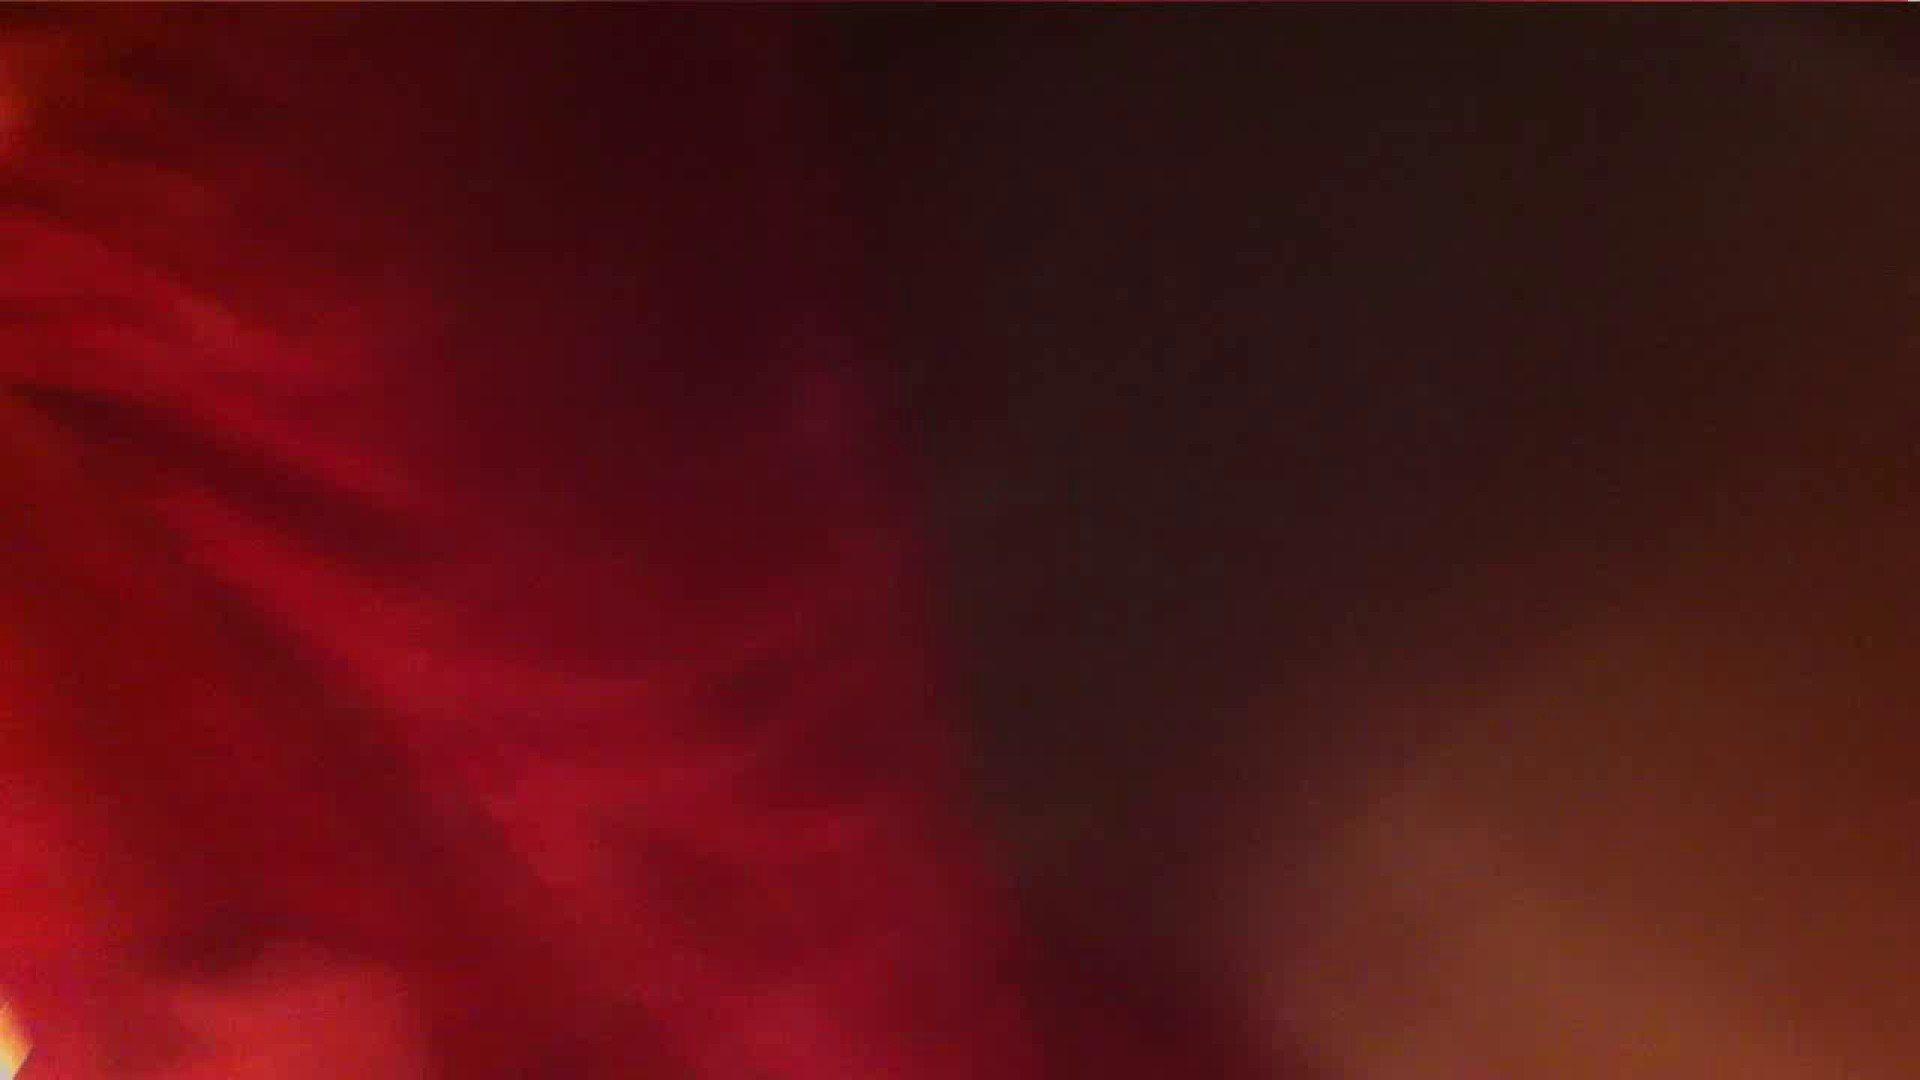 vol.36 美人アパレル胸チラ&パンチラ ポニテ(゚∀゚)キタコレ!! パンチラ エロ無料画像 90PIX 10